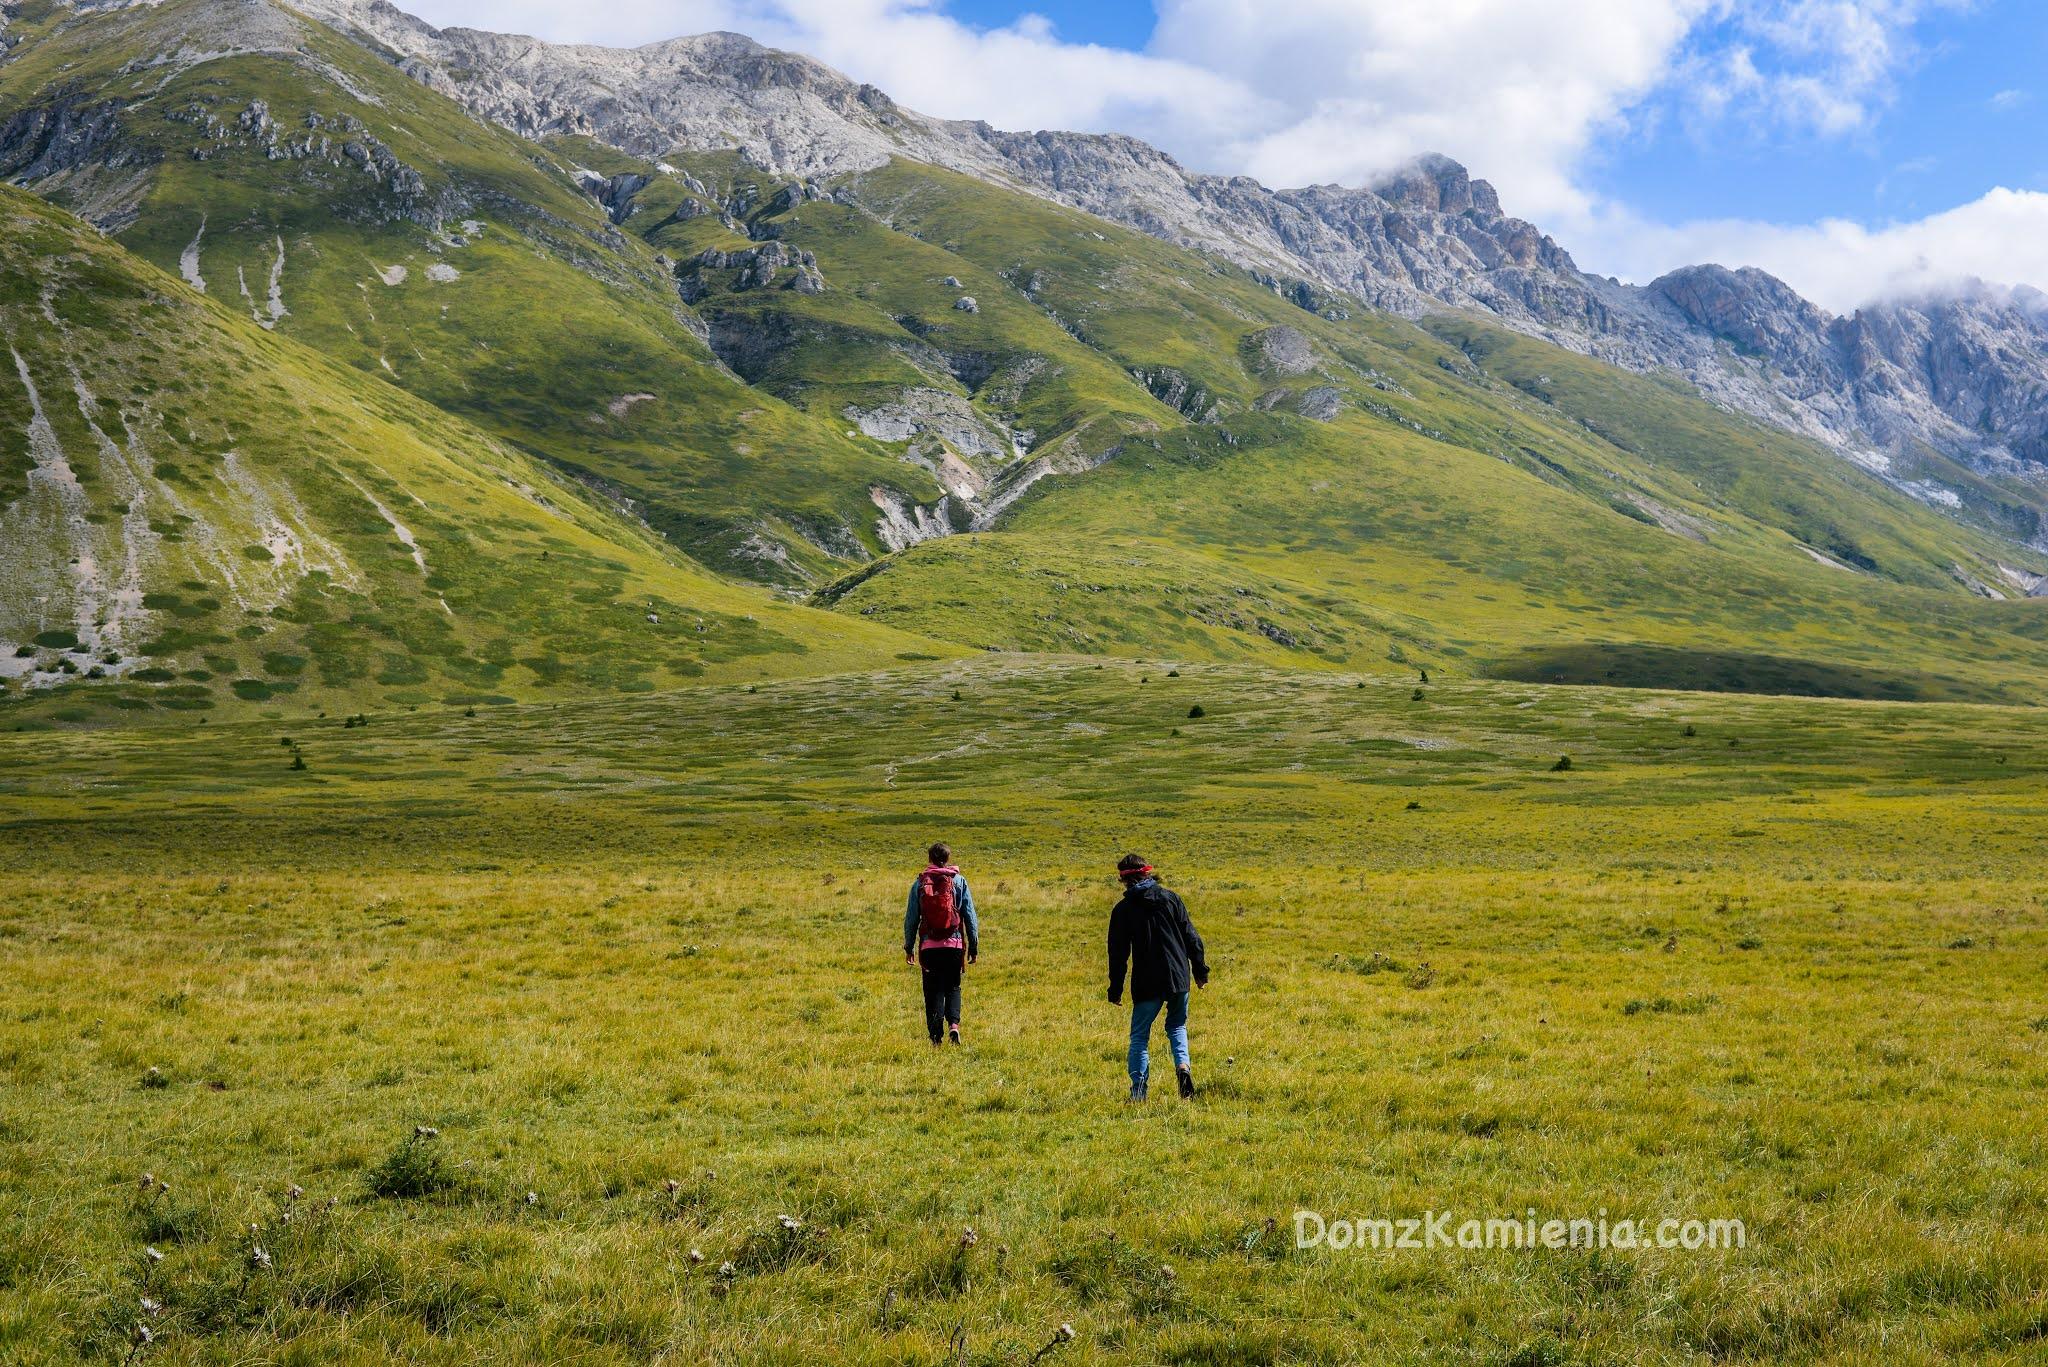 Abruzzo, Campo Imperatore Dom z Kamienia blog